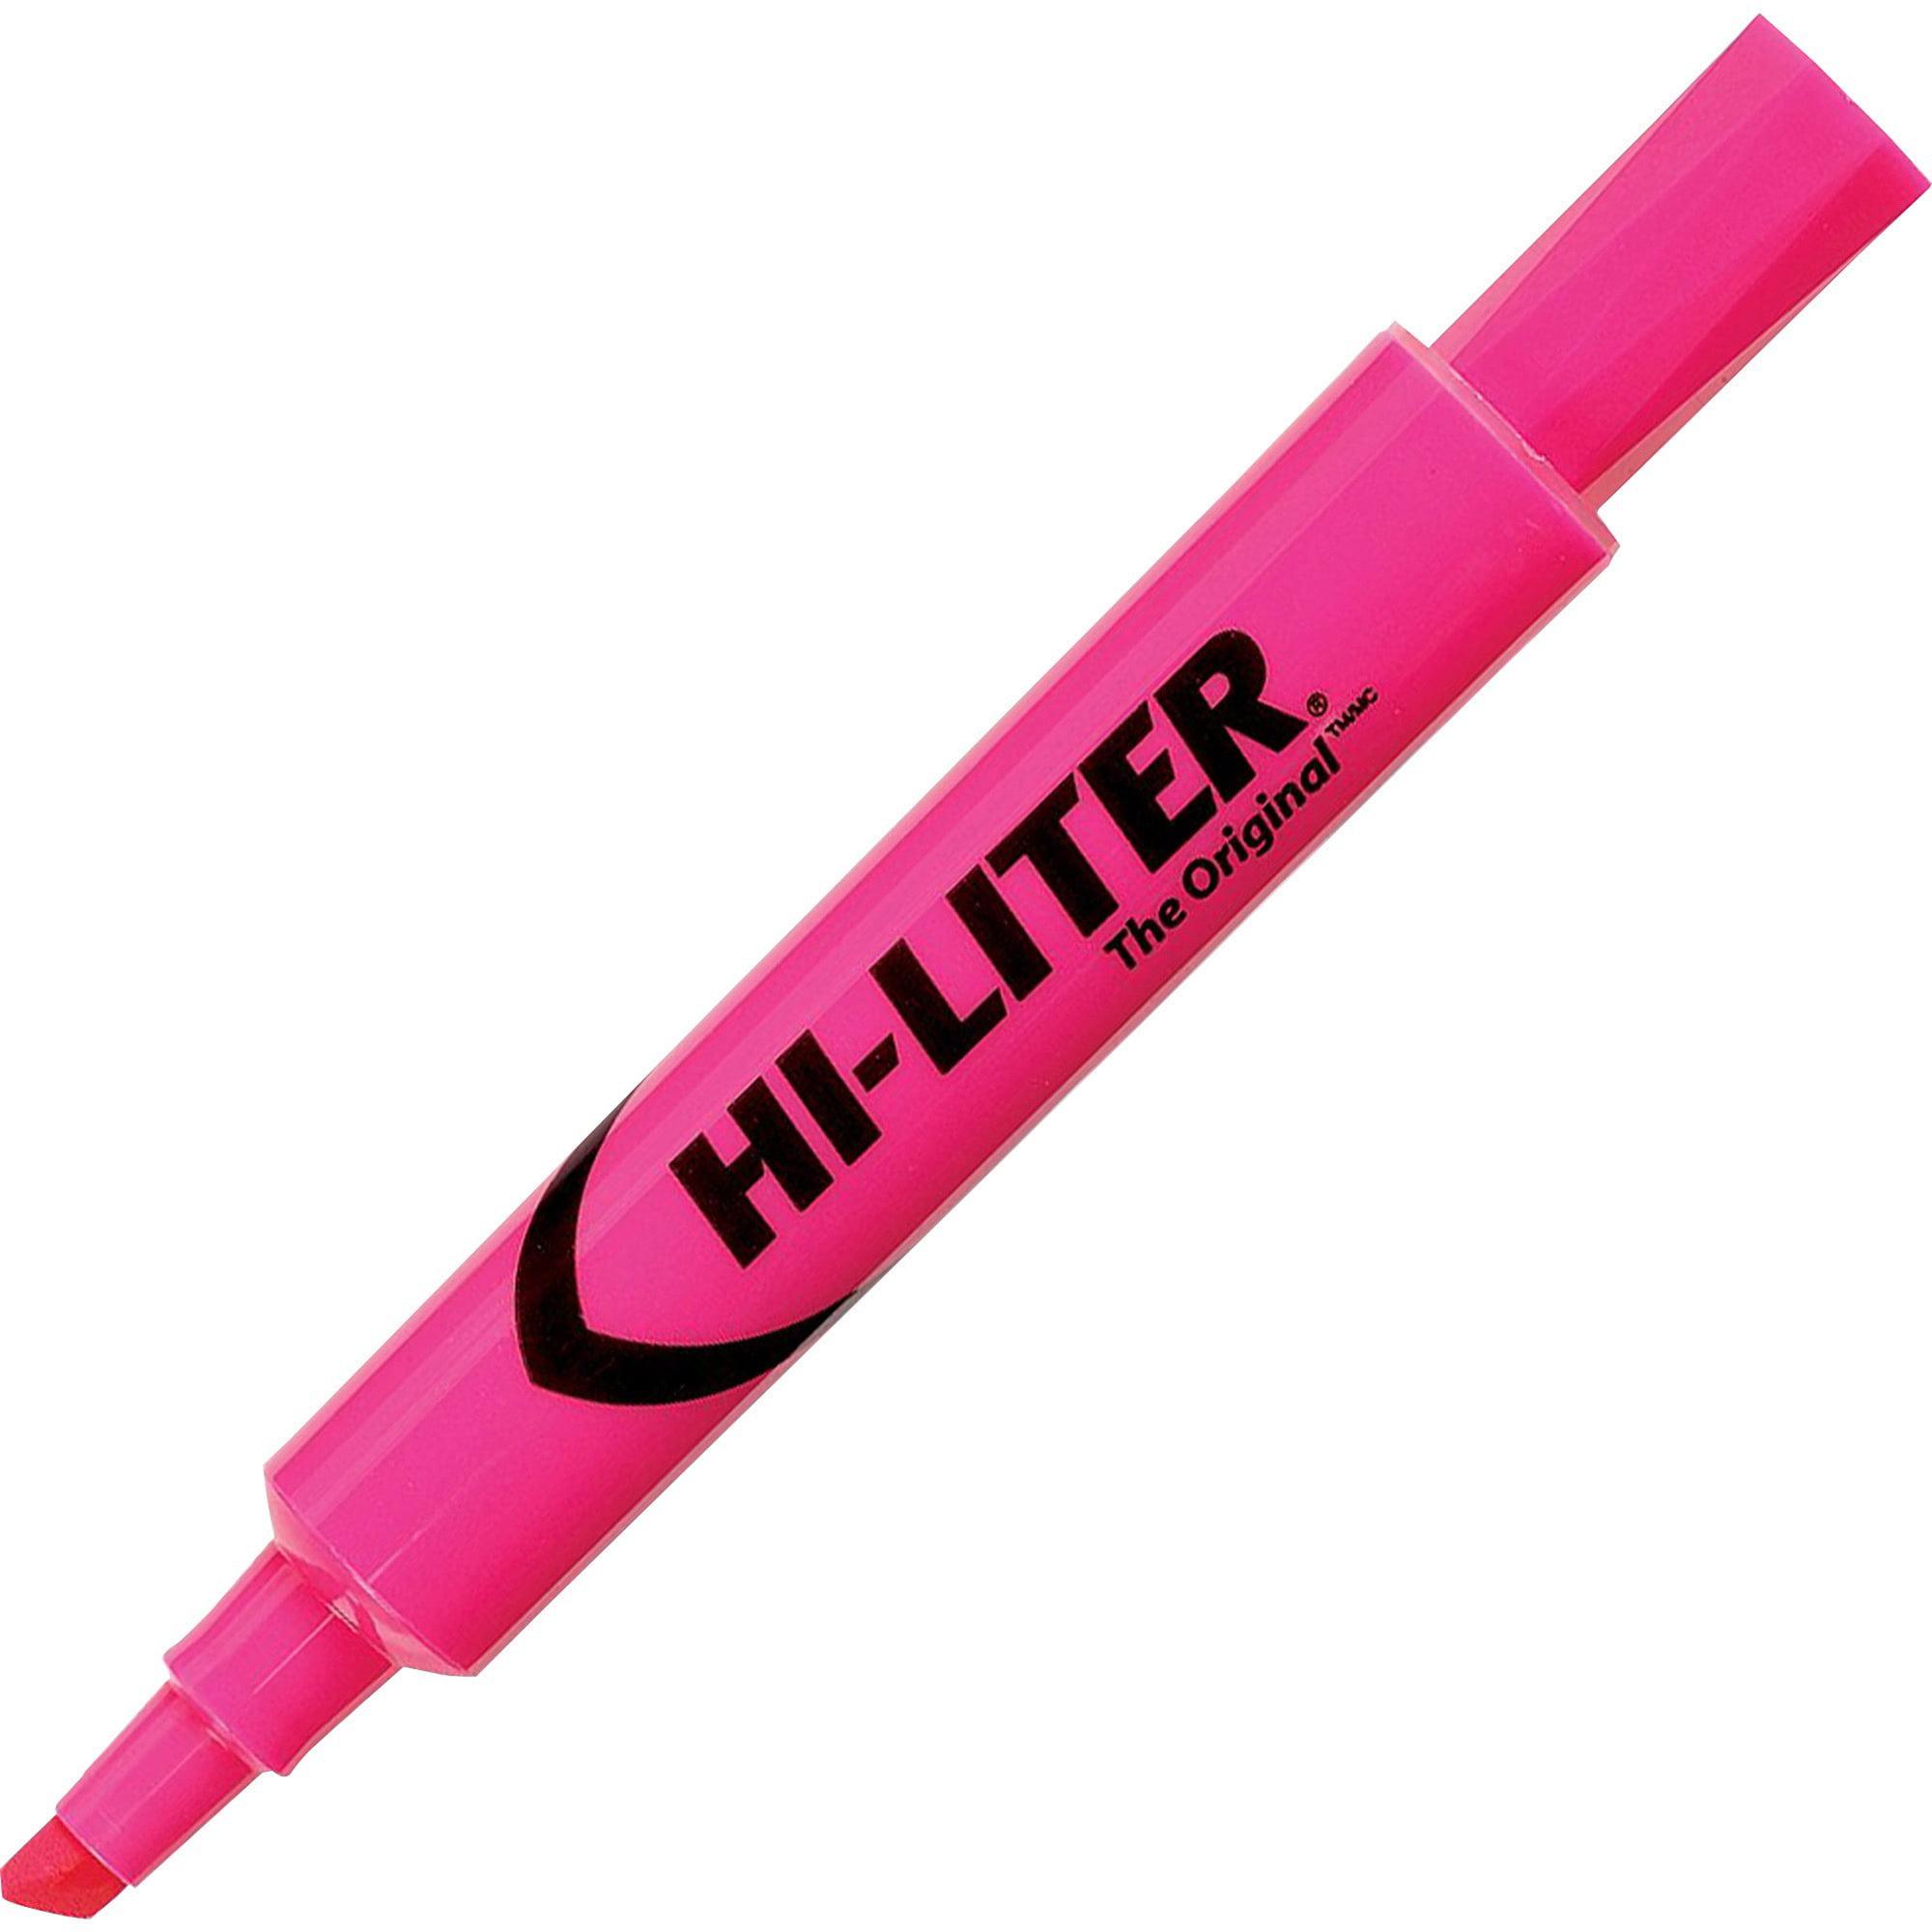 Avery HI-LITER Desk-Style Highlighter, Chisel Tip, Fluorescent Pink Ink, Dozen